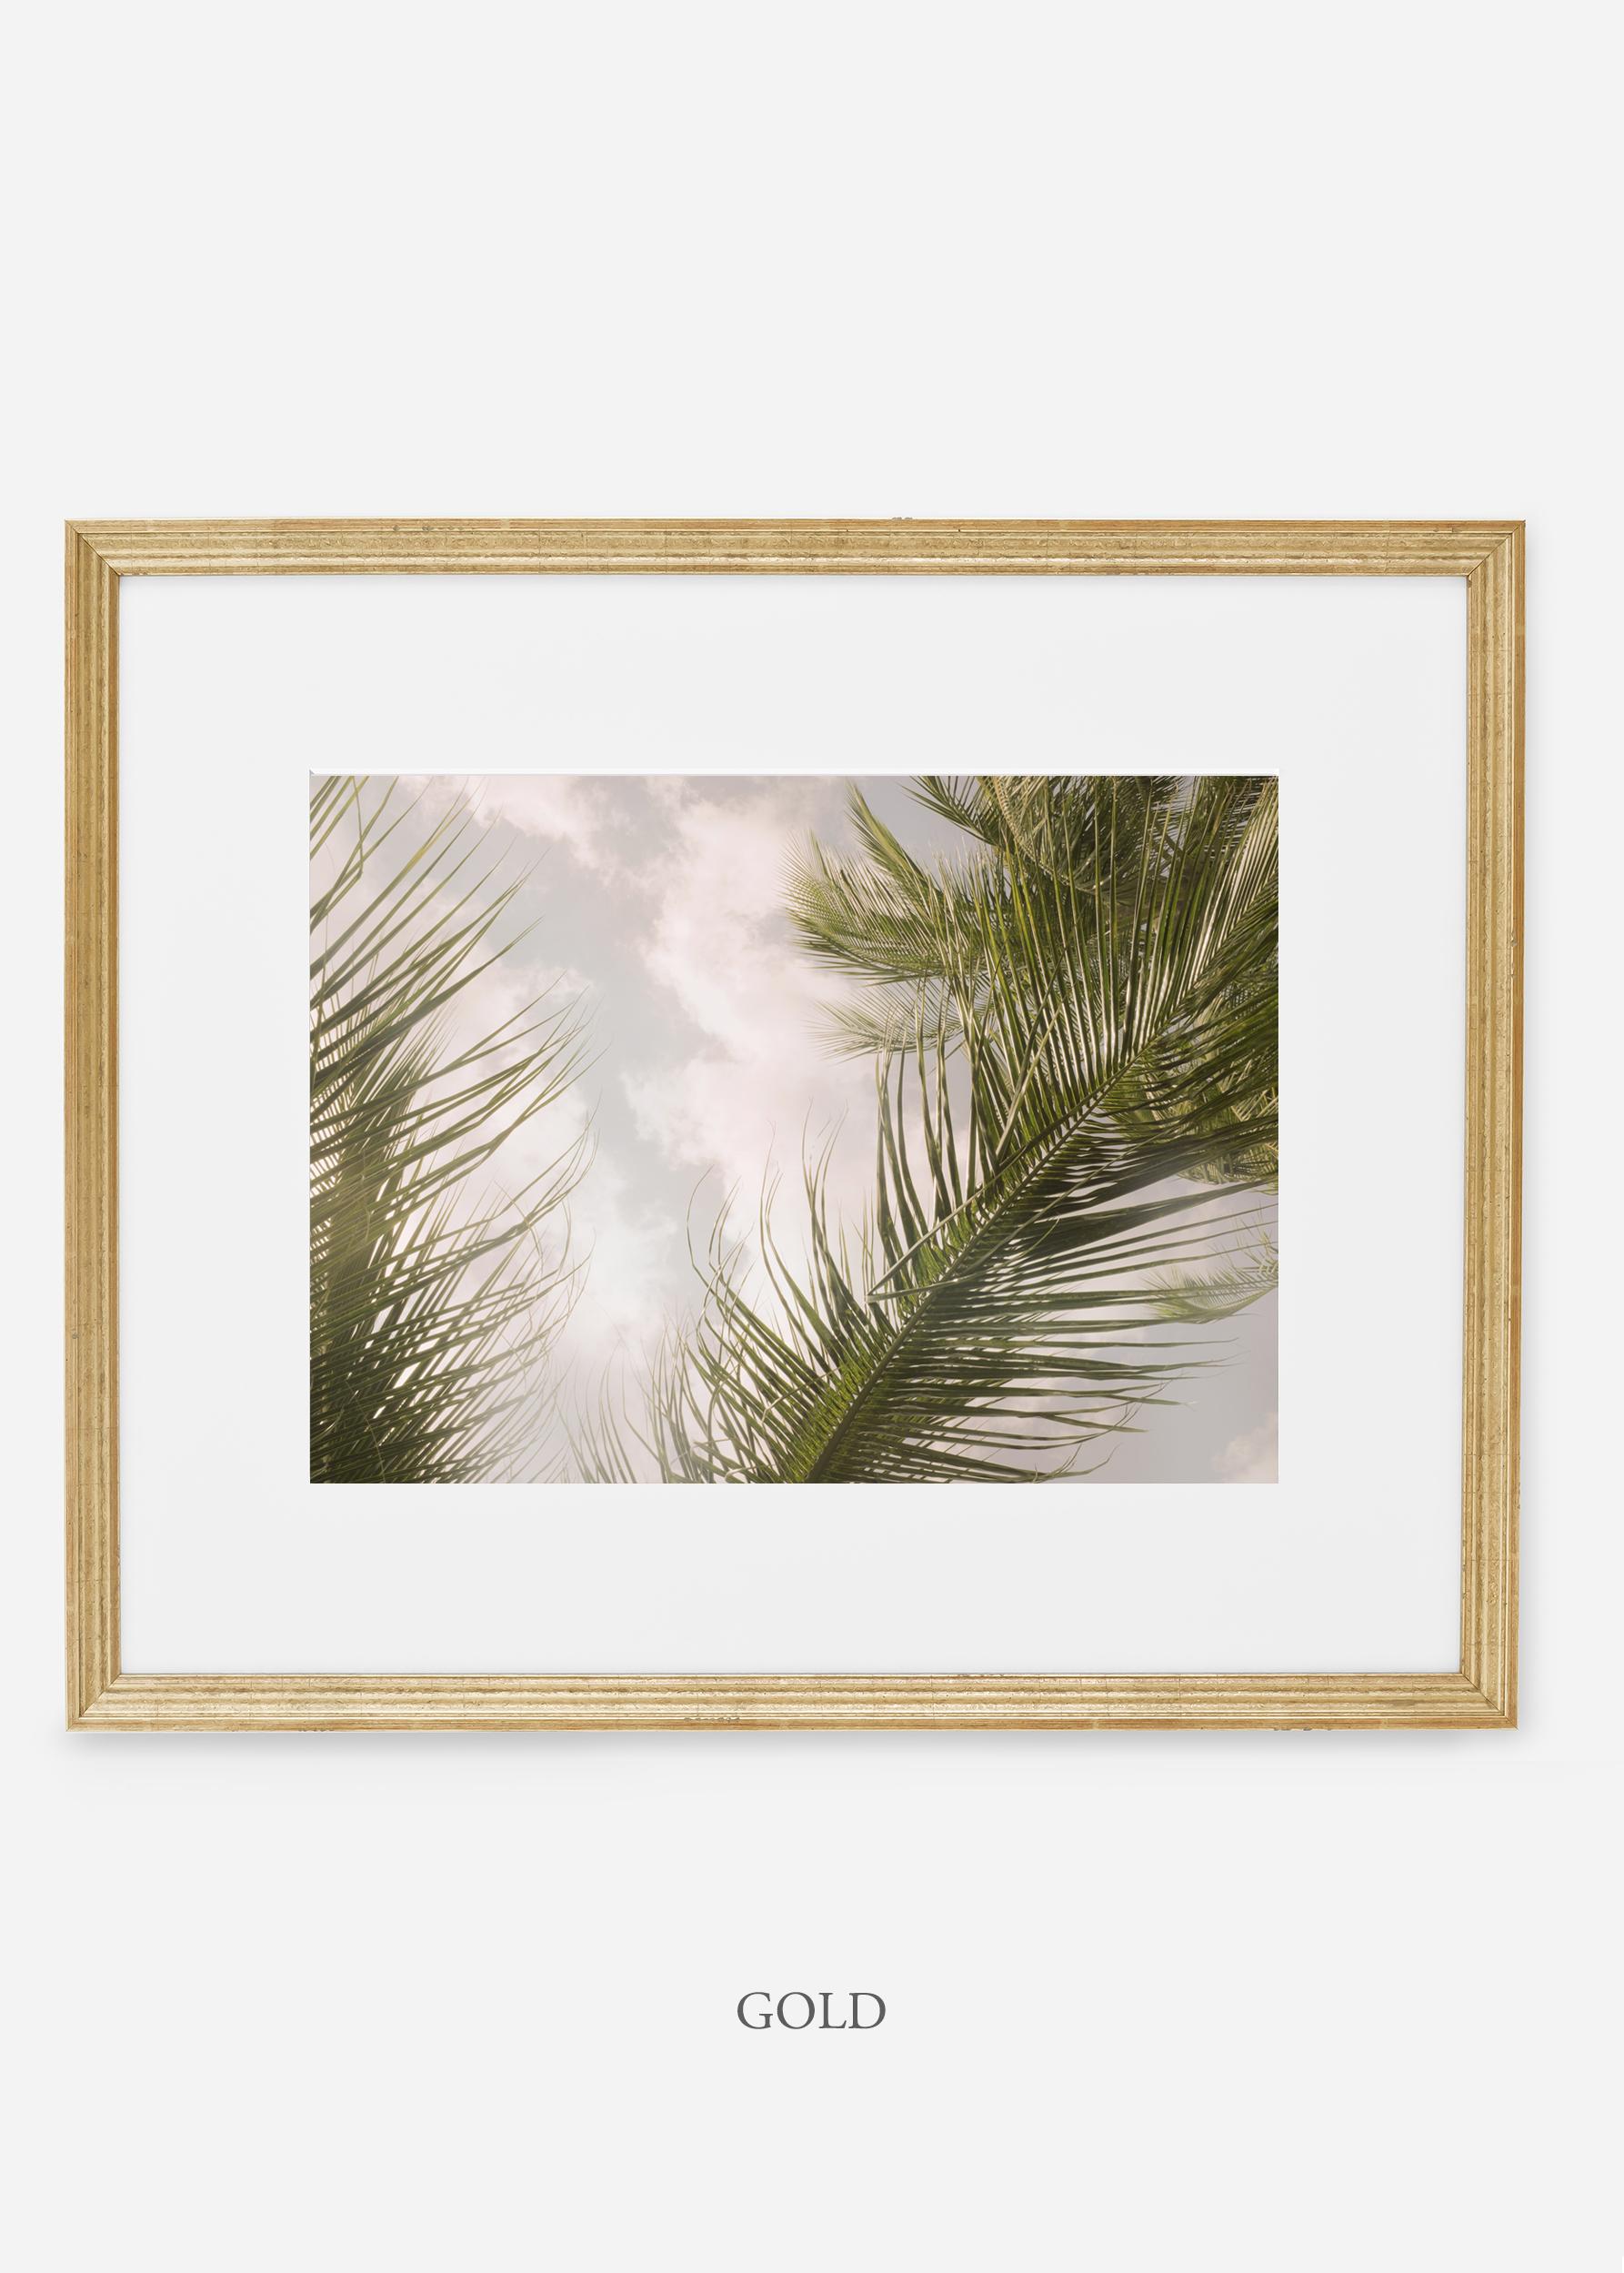 interiordesign_goldframe_AiryPalmTreeNo.1_art_tropical_palmtree_StormyGrayPalm.jpg